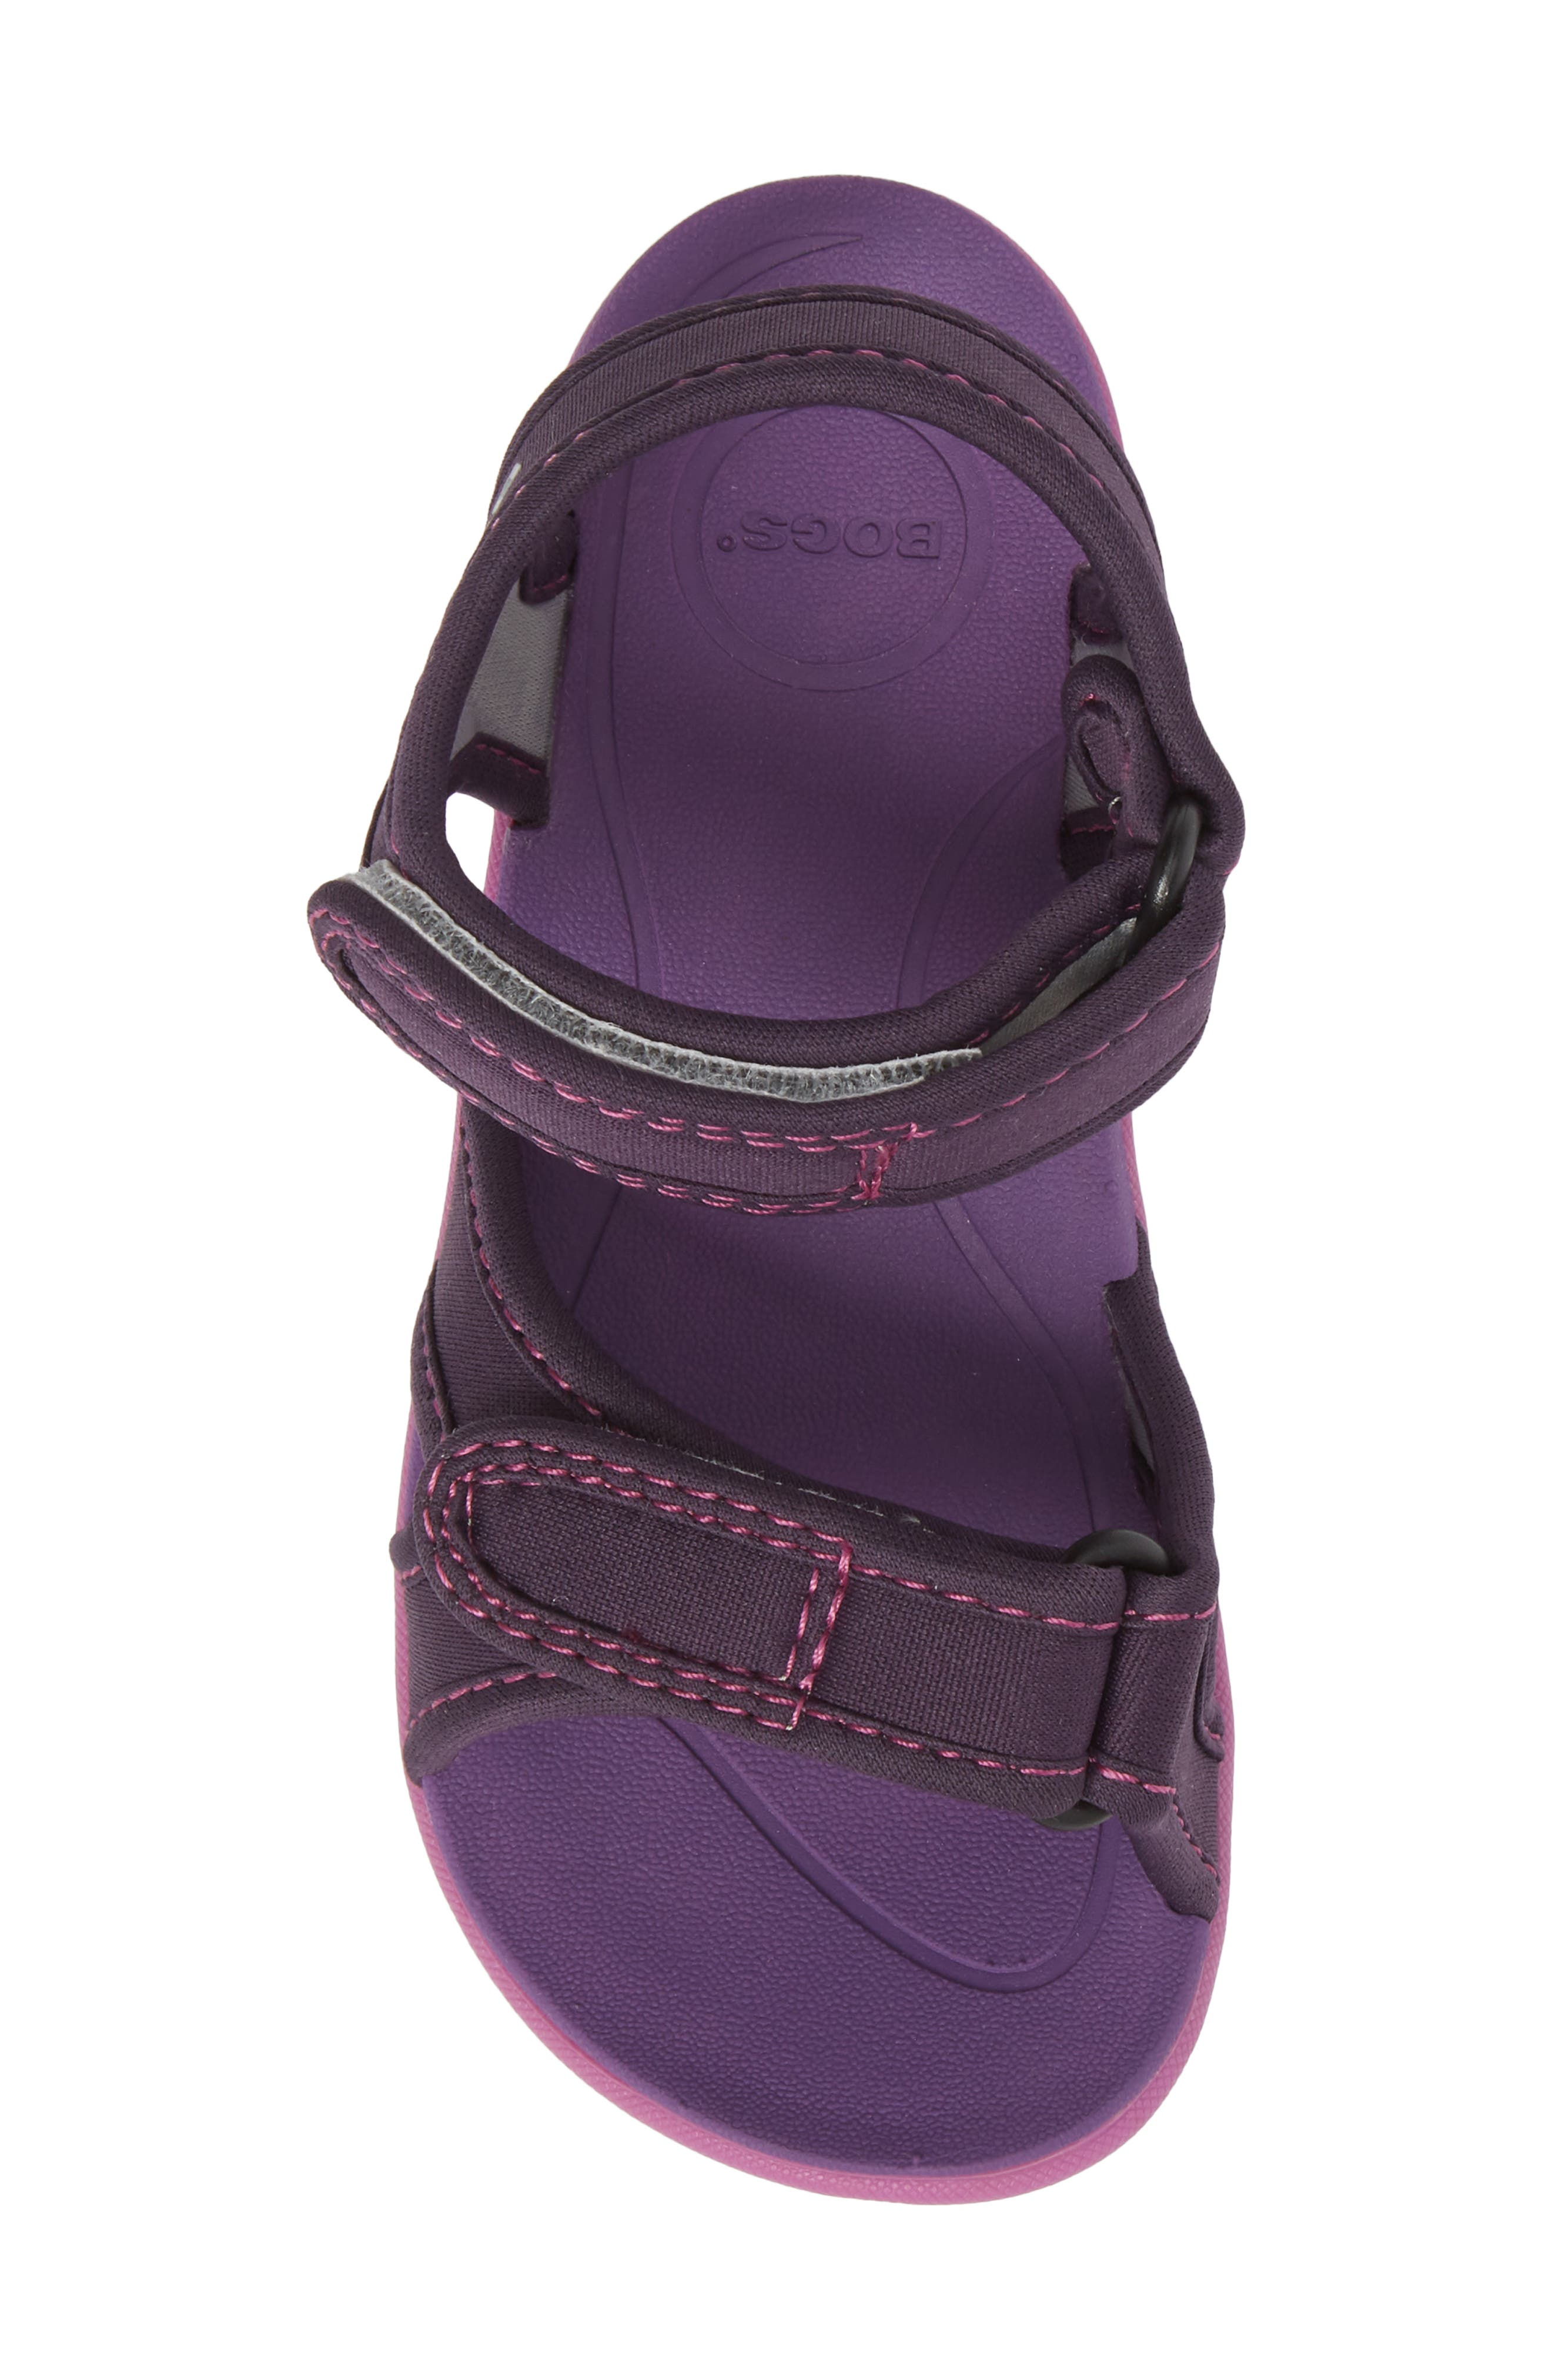 Whitefish Waterproof Sandal,                             Alternate thumbnail 5, color,                             551